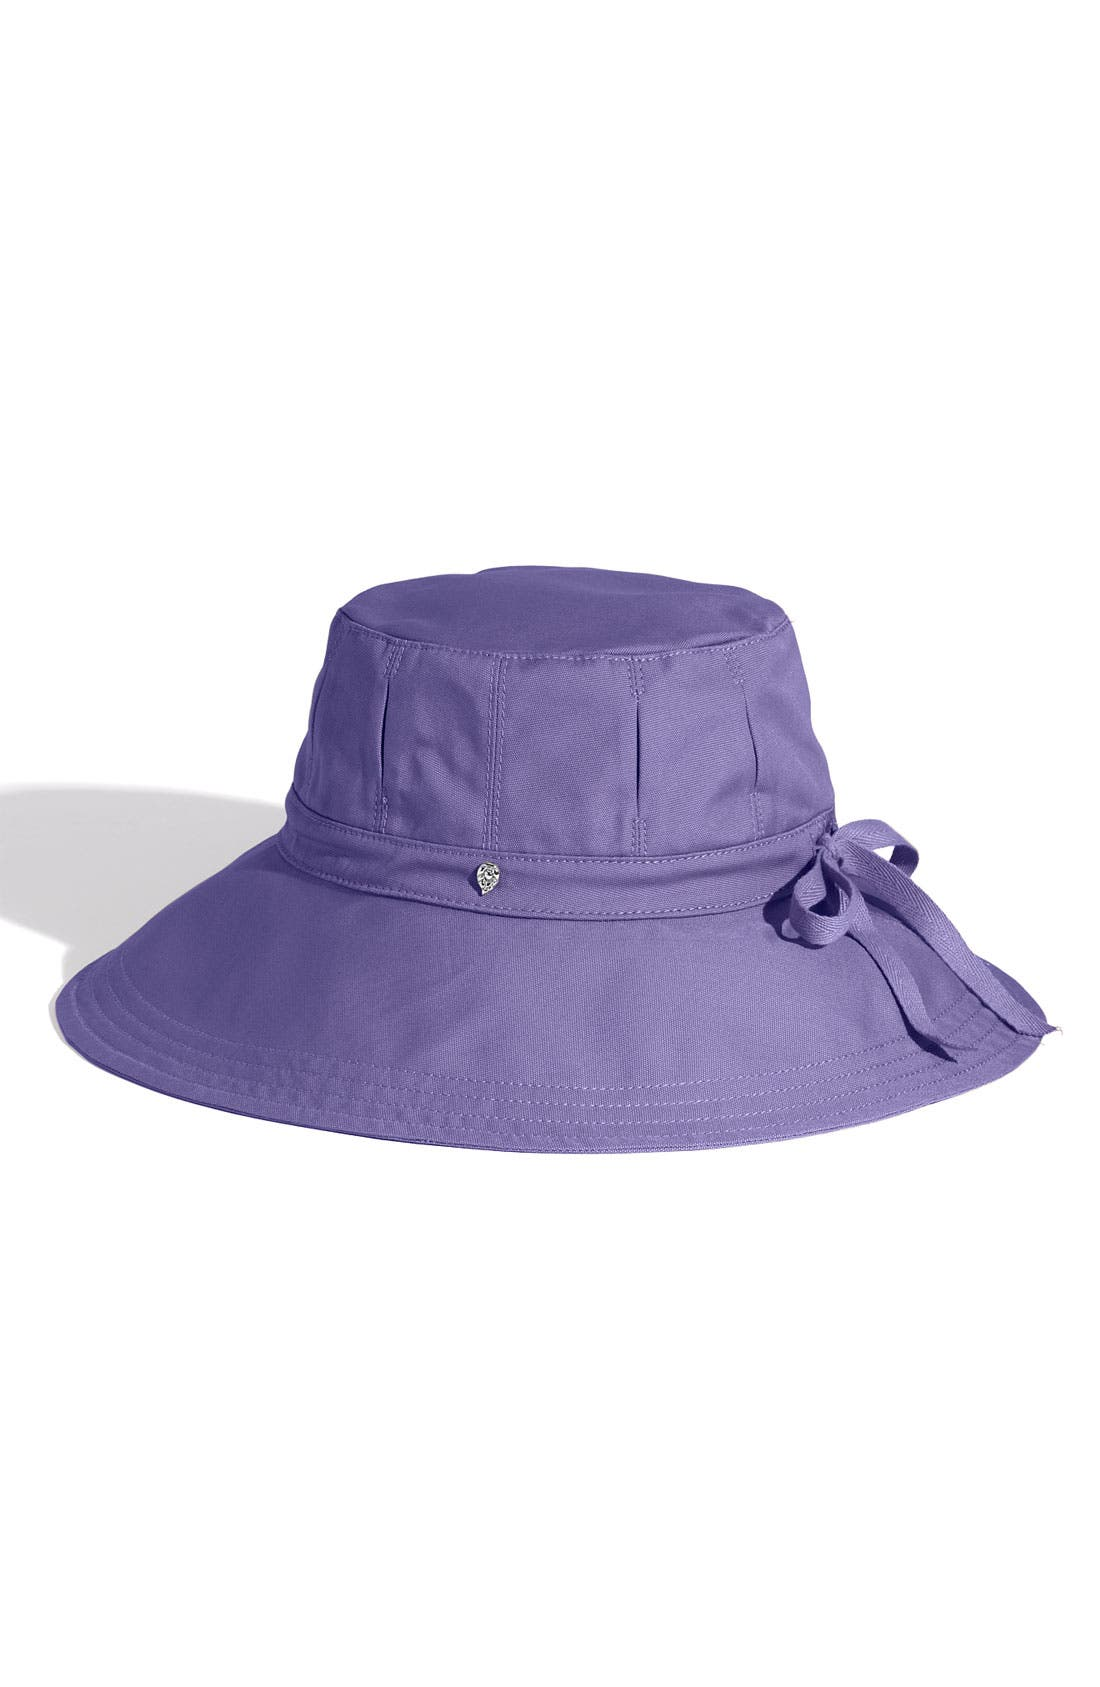 Main Image - Helen Kaminski 'Zindira' Hat